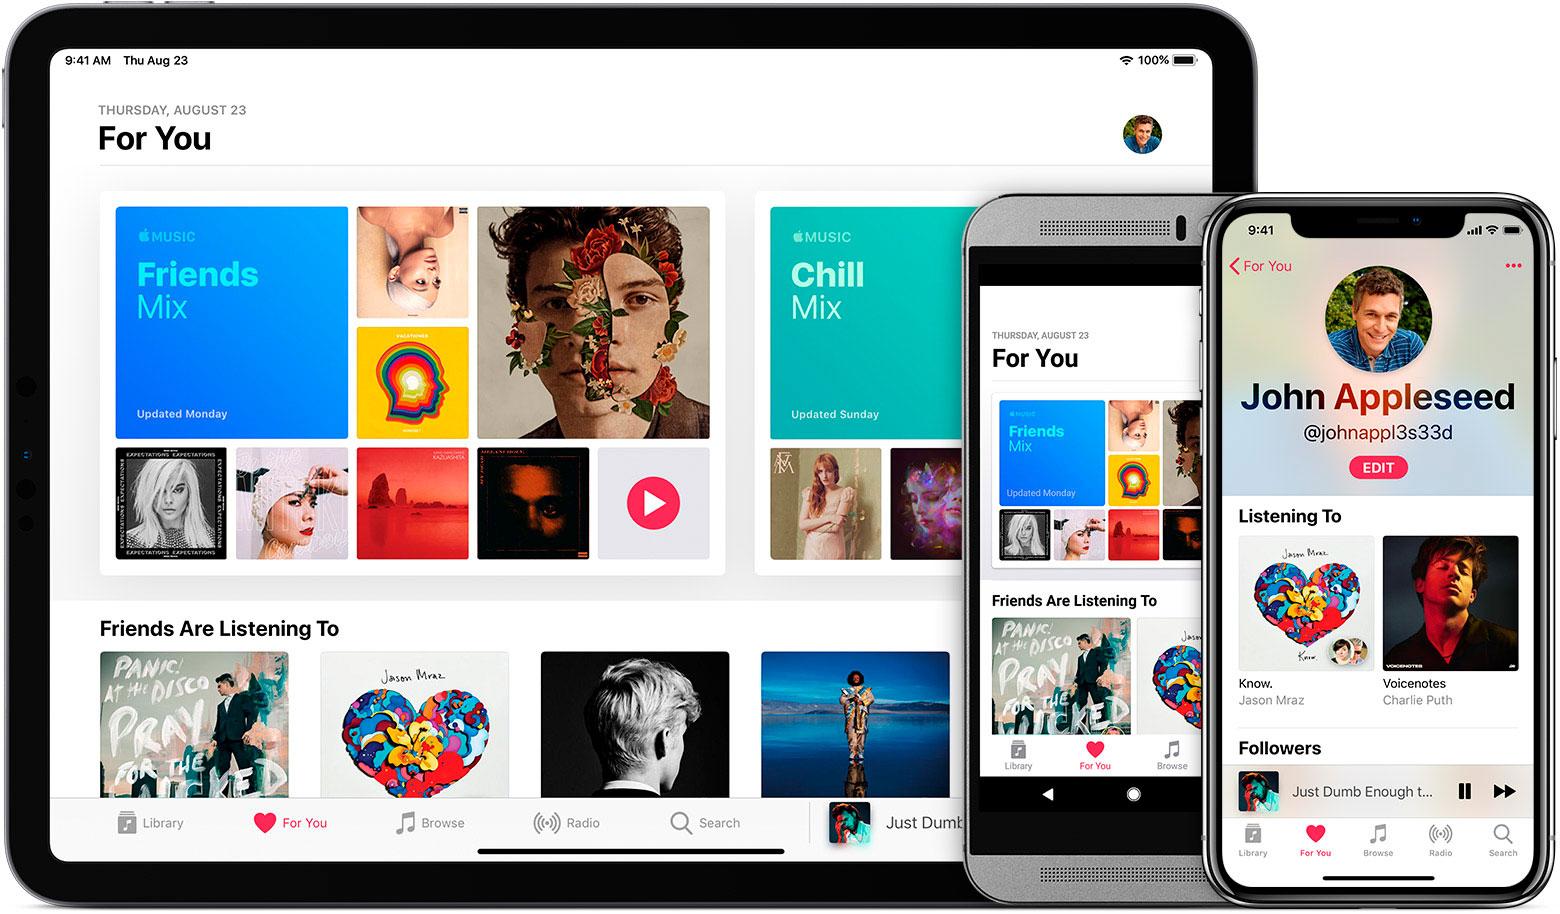 https://www.macfreak.nl/modules/news/images/zArt.AppleMusic-iPad-iPhone-Android.jpg